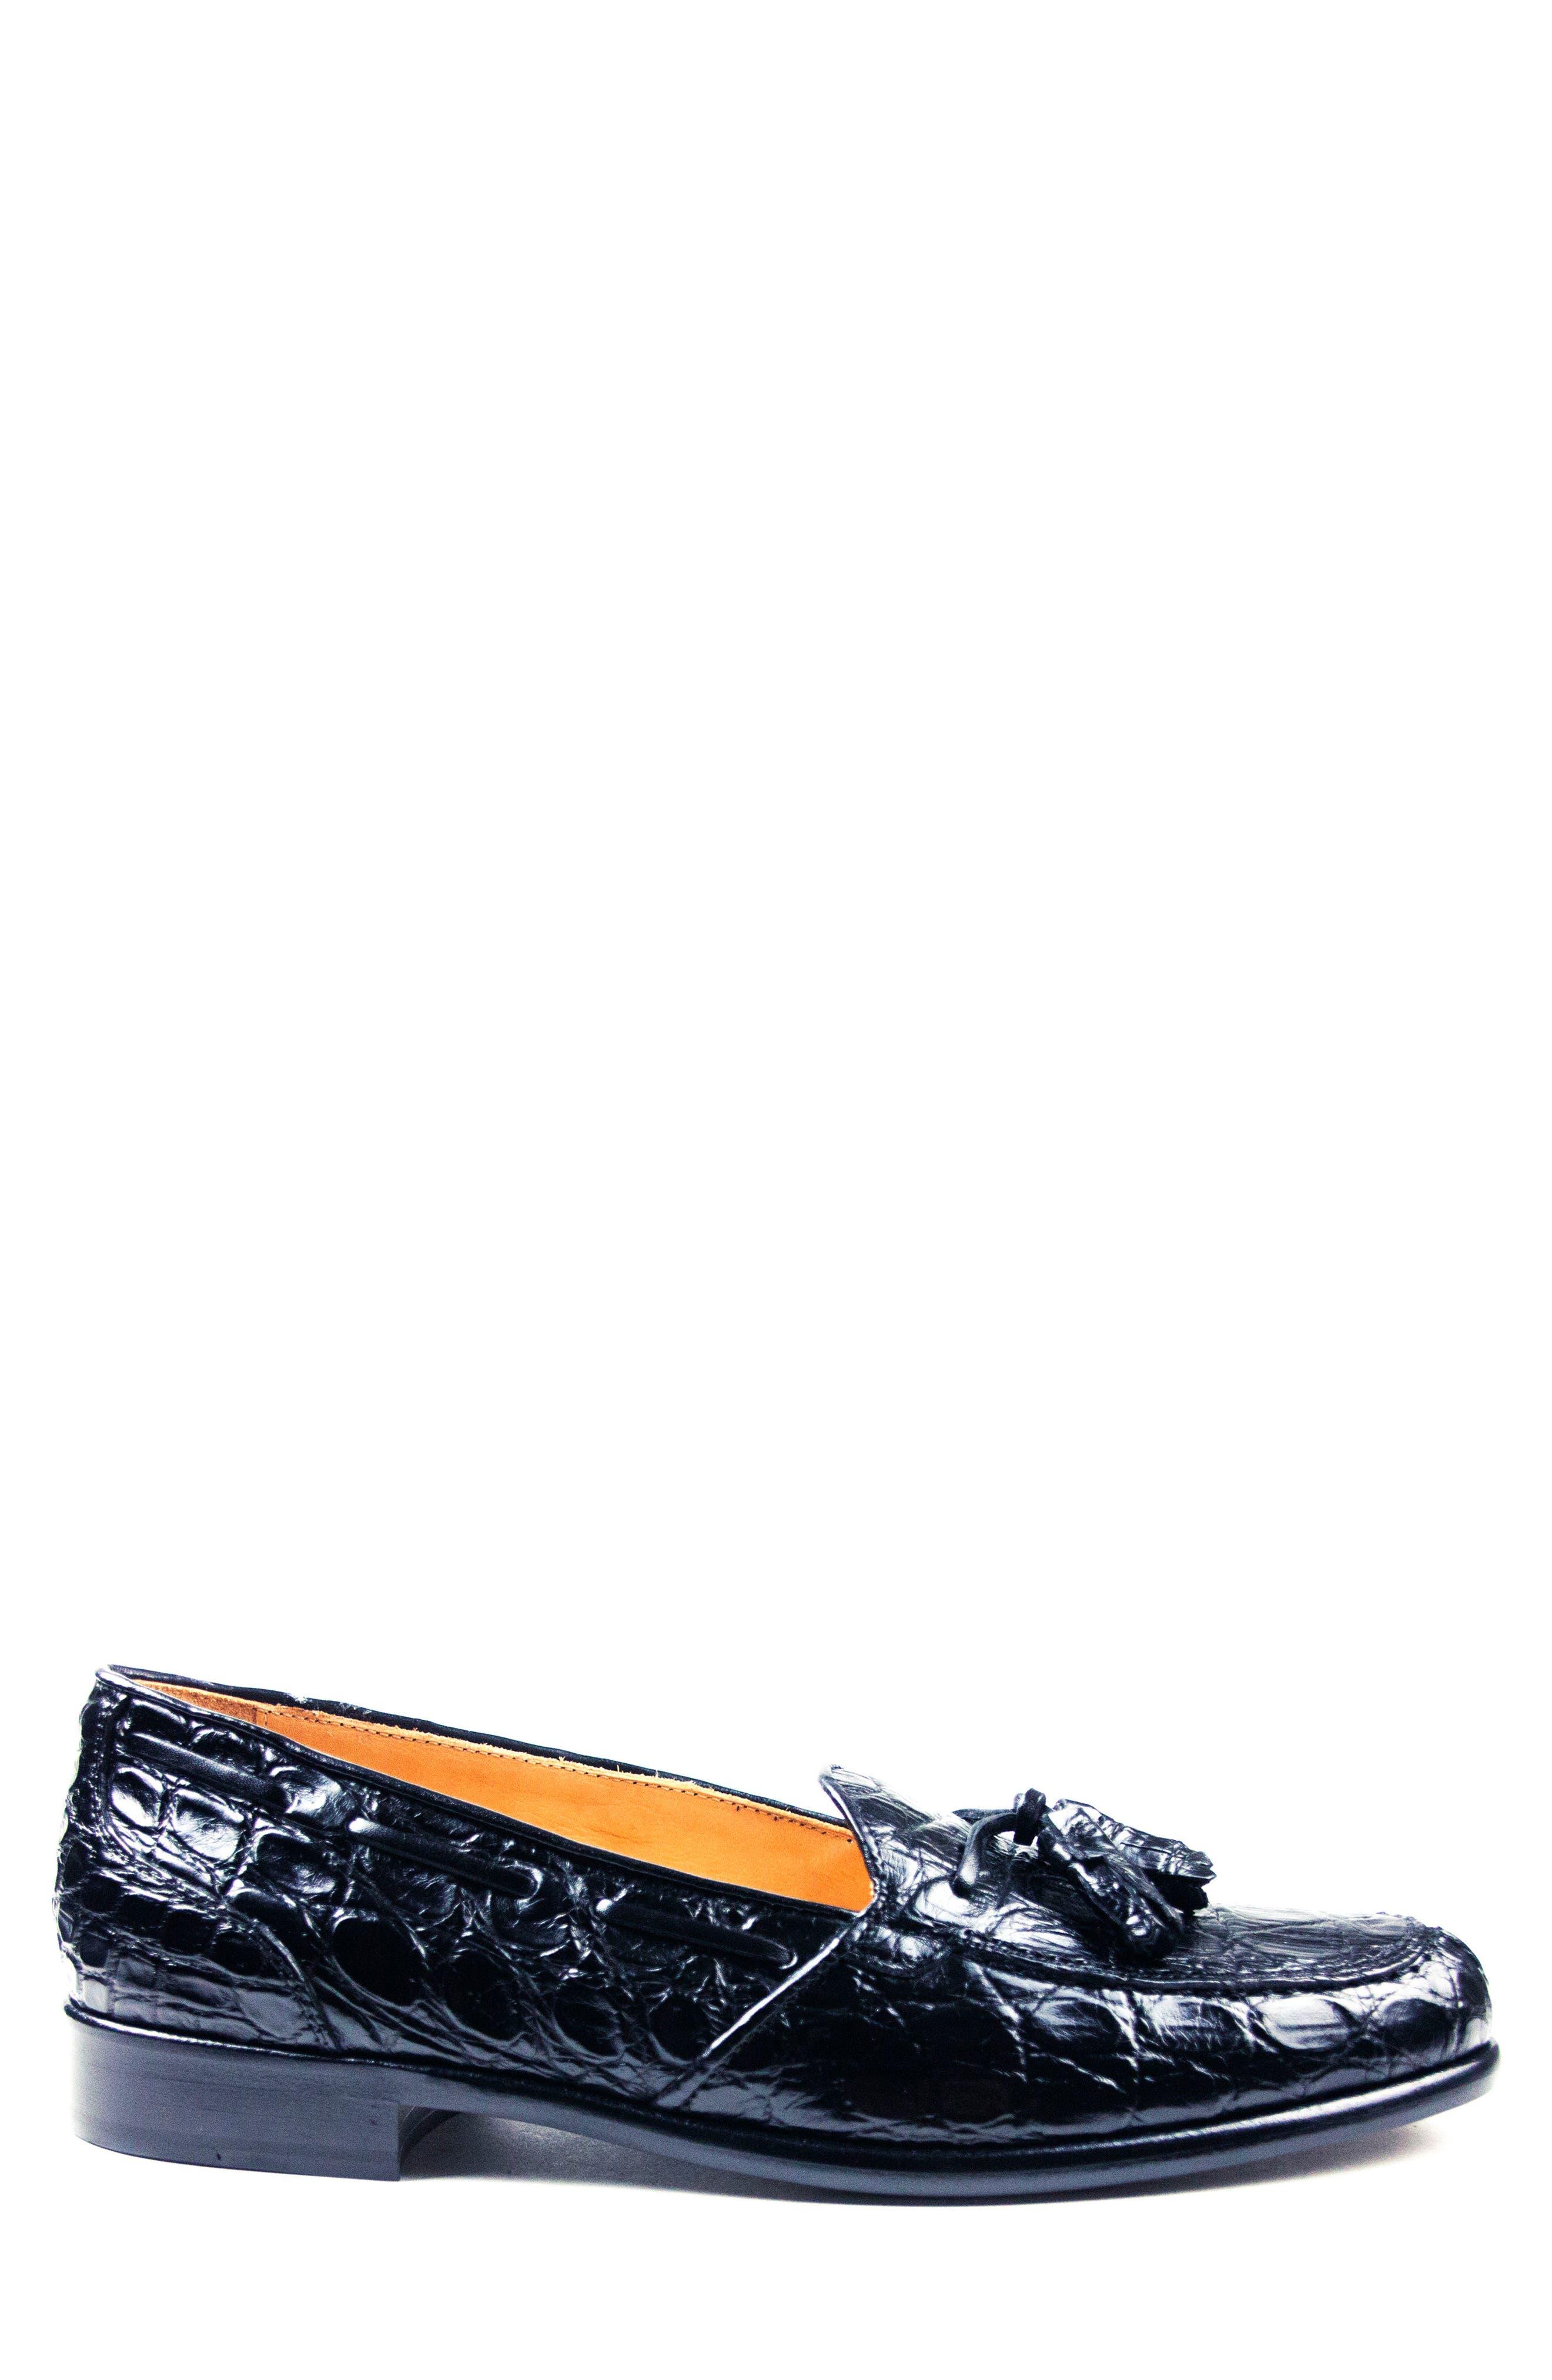 Franco Tassel Exotic Leather Loafer,                             Alternate thumbnail 5, color,